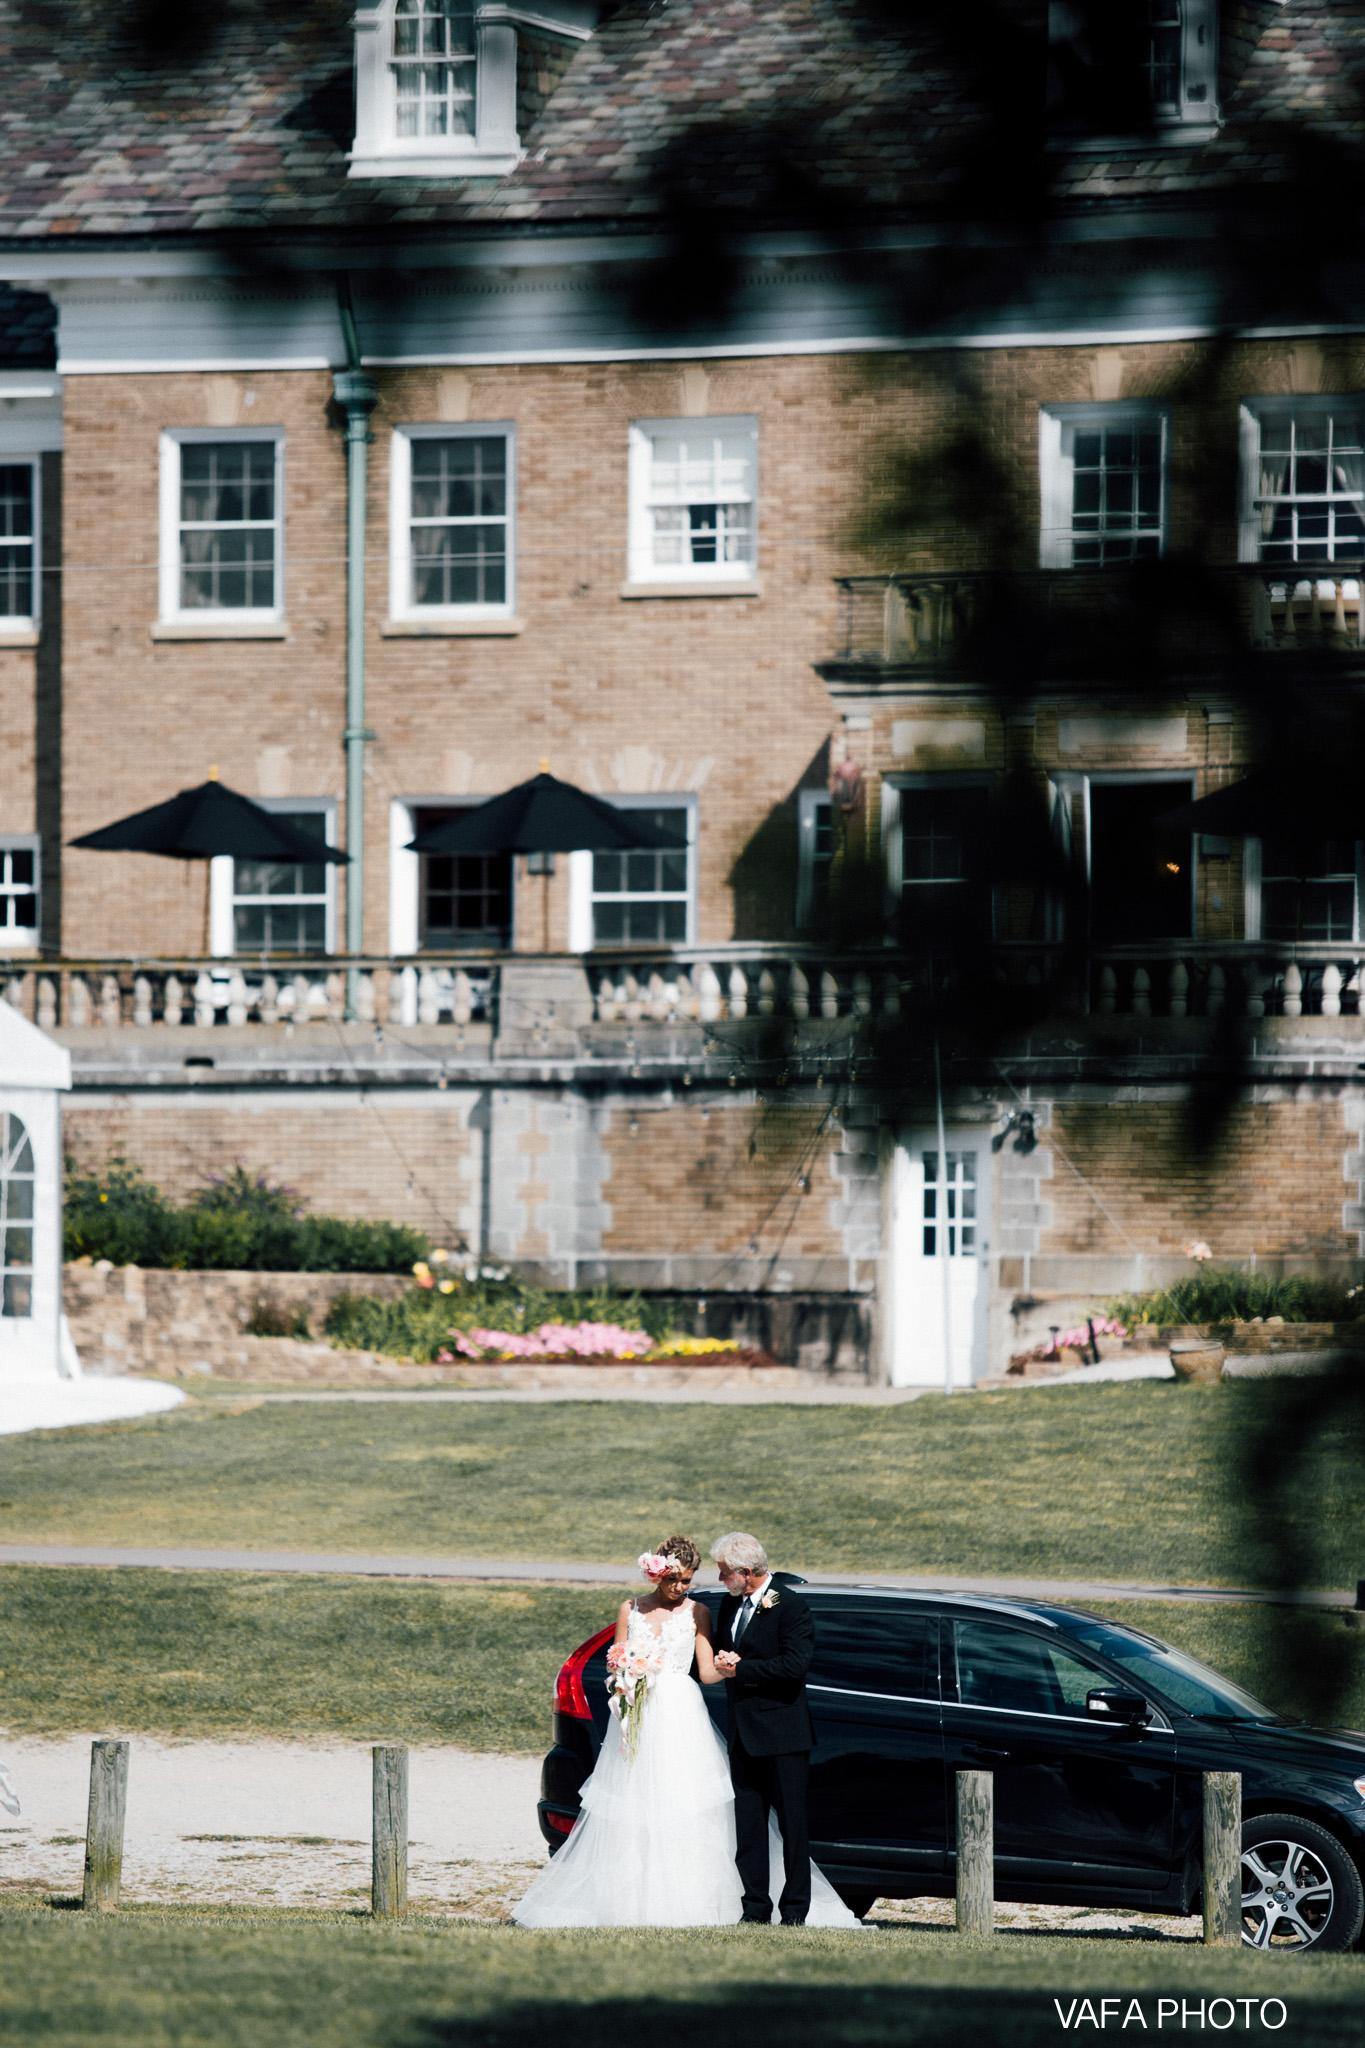 The-Felt-Estate-Wedding-Kailie-David-Vafa-Photo-272.jpg